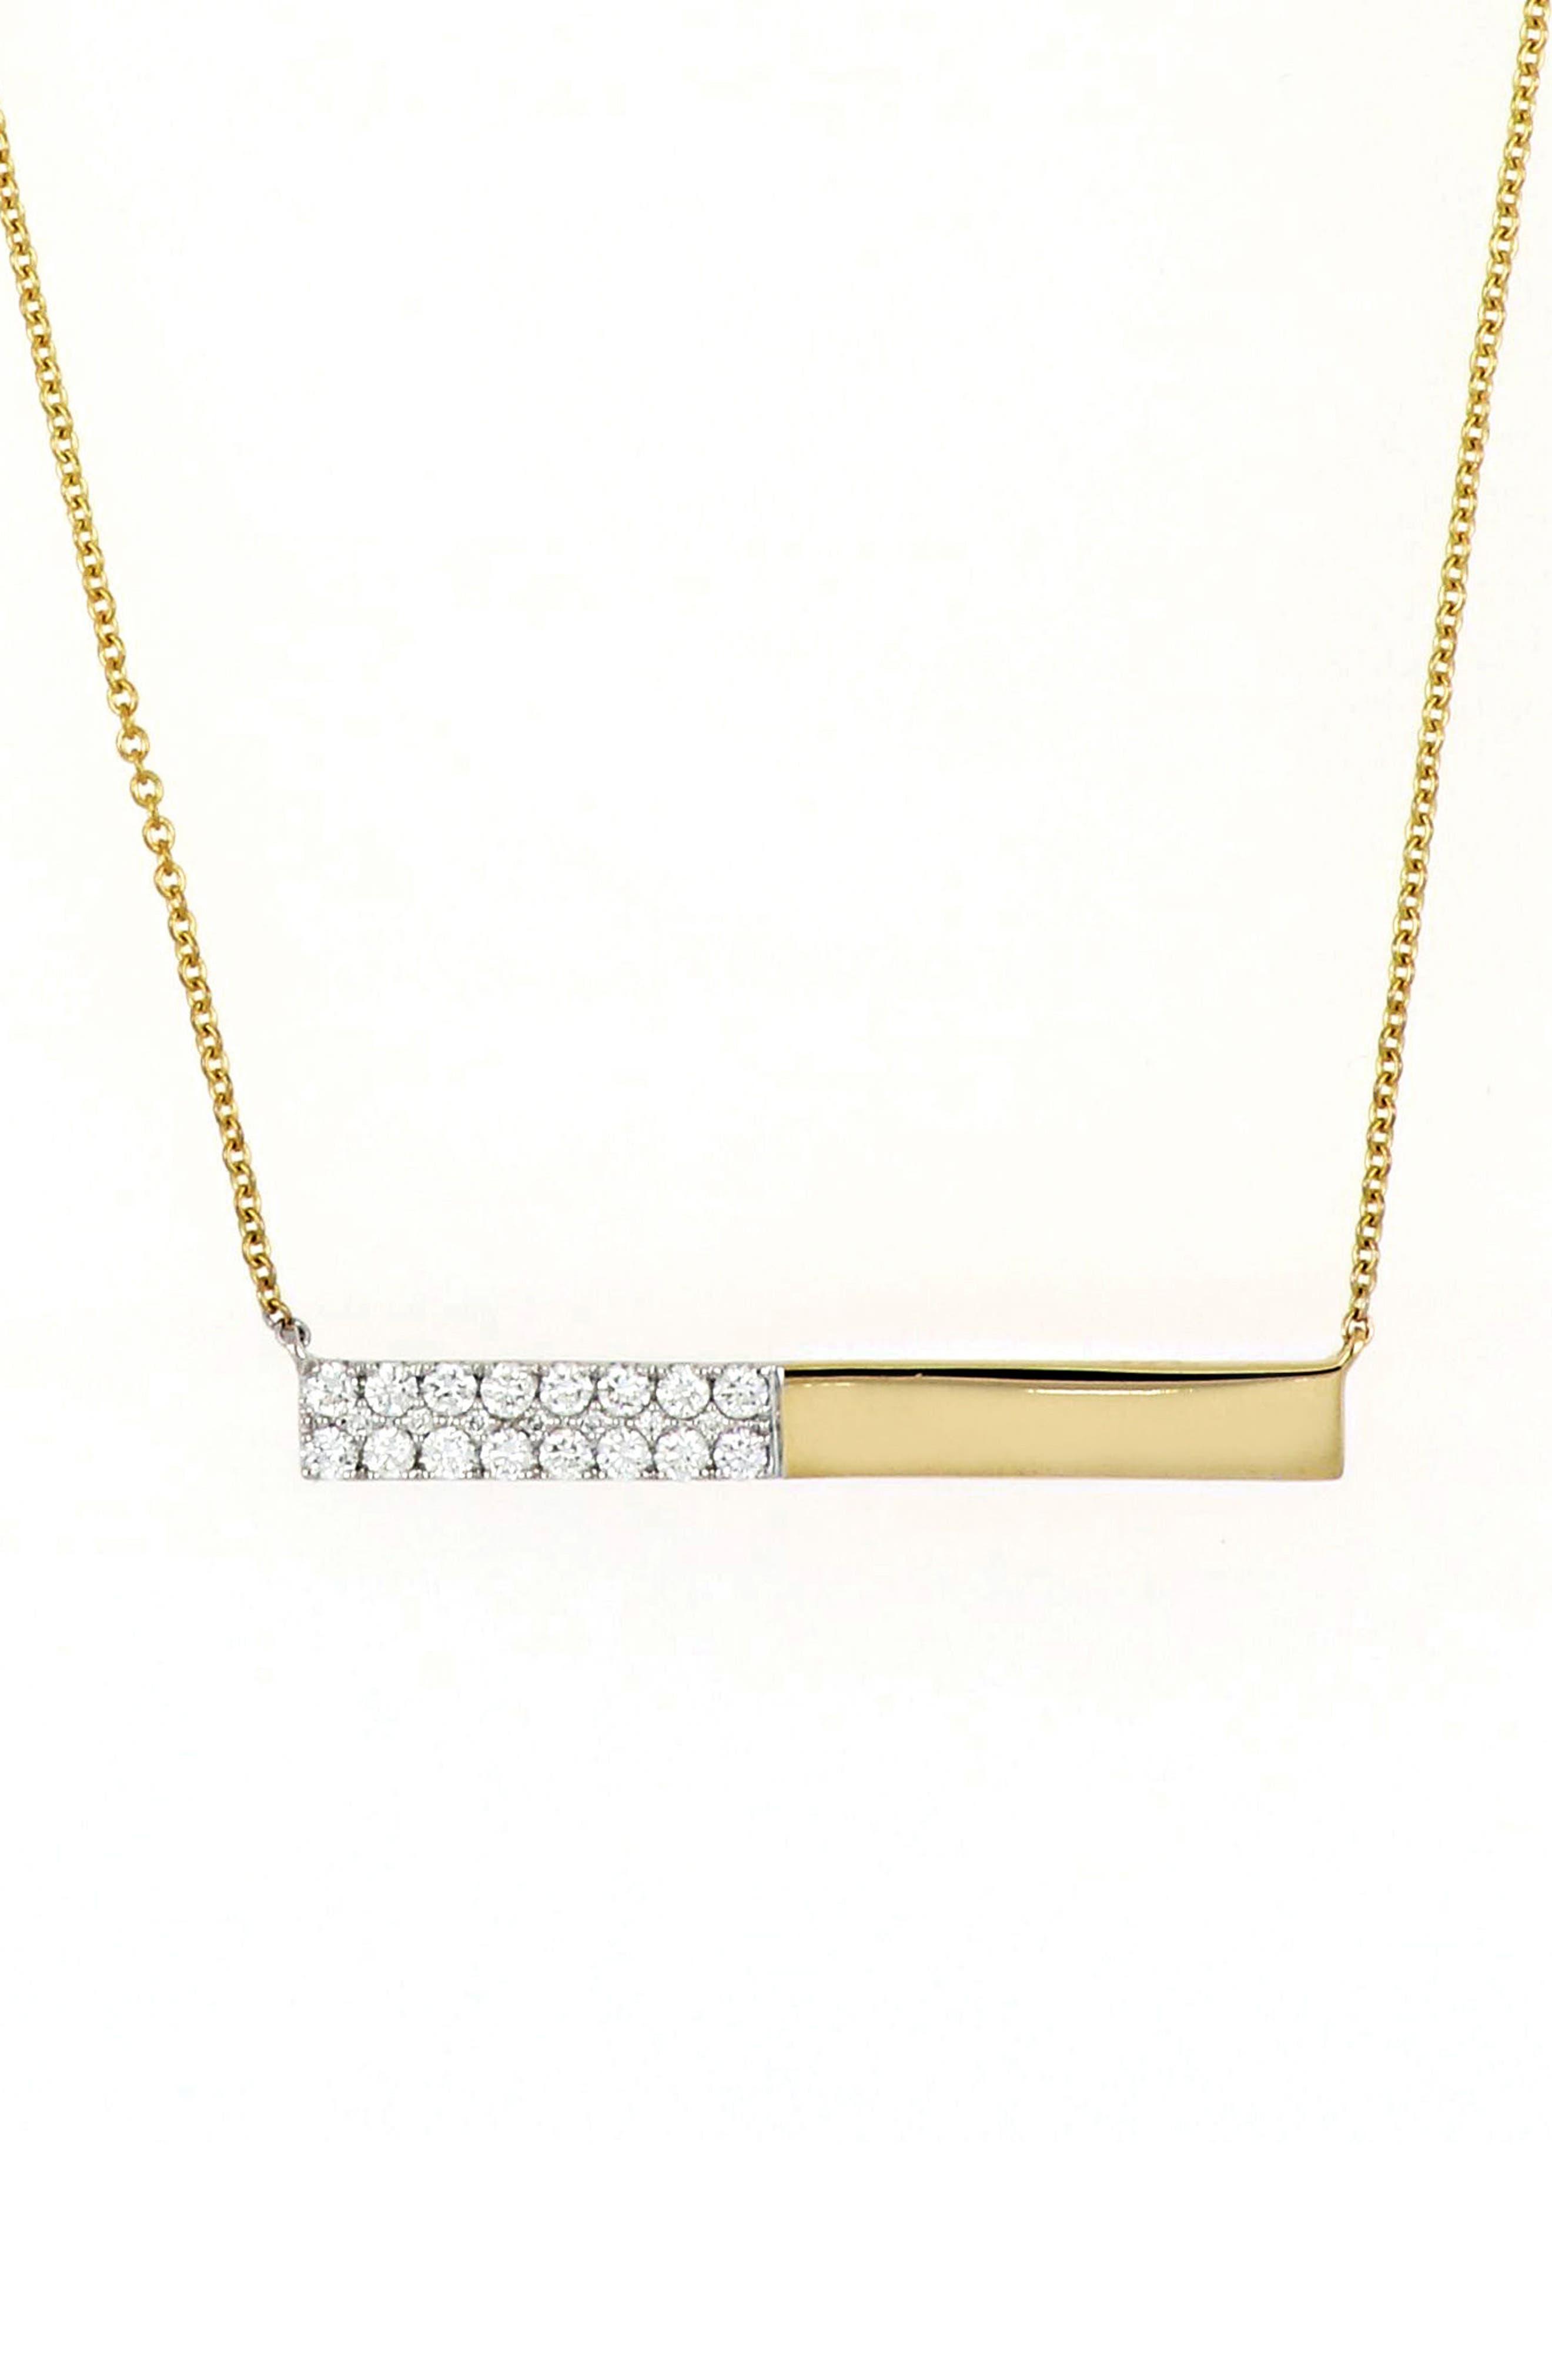 Kiera Diamond Bar Pendant Necklace,                         Main,                         color, YELLOW GOLD/ WHITE GOLD